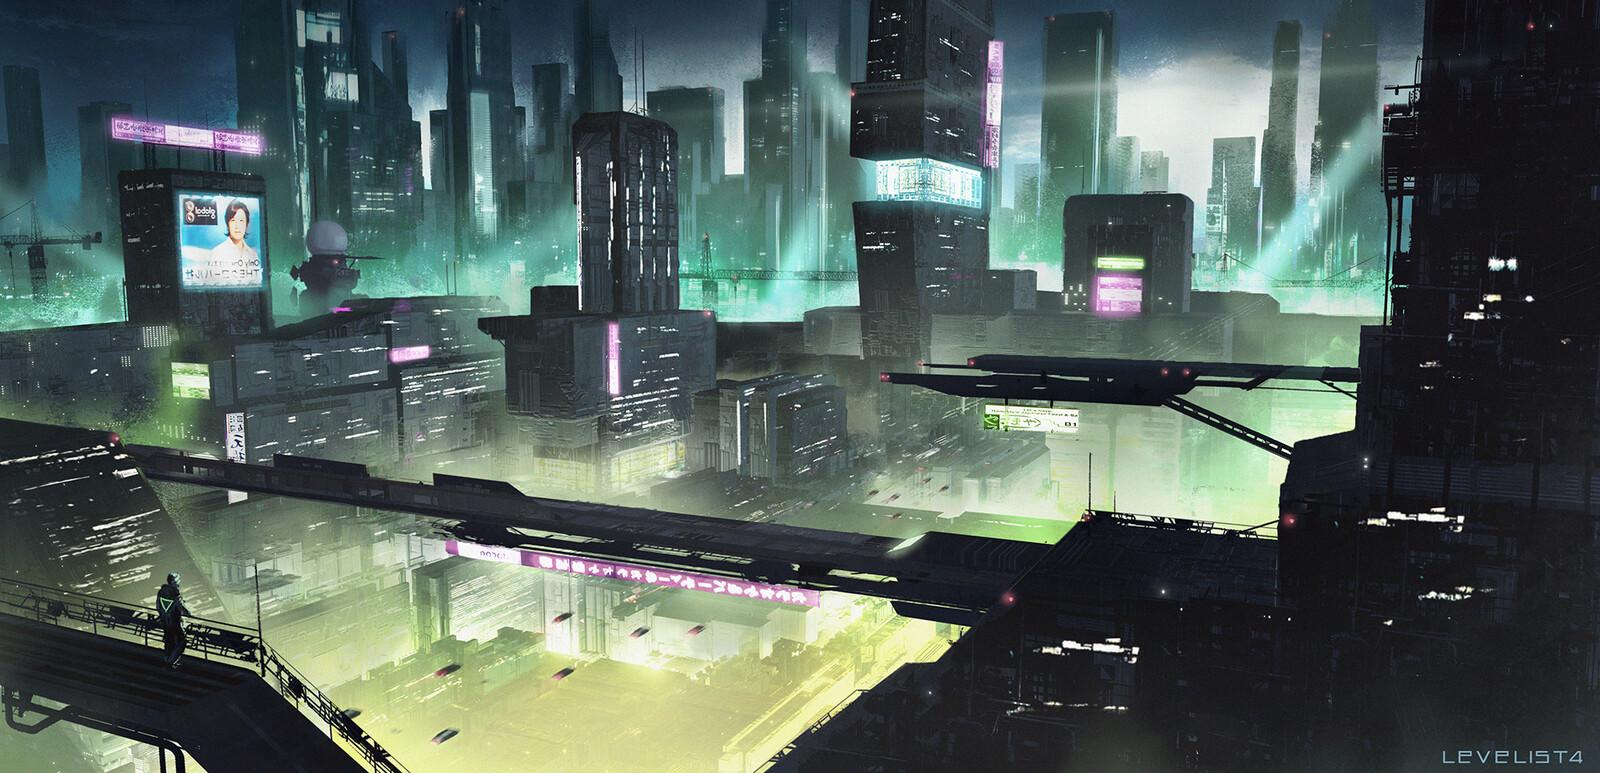 Cyberpunk megacity